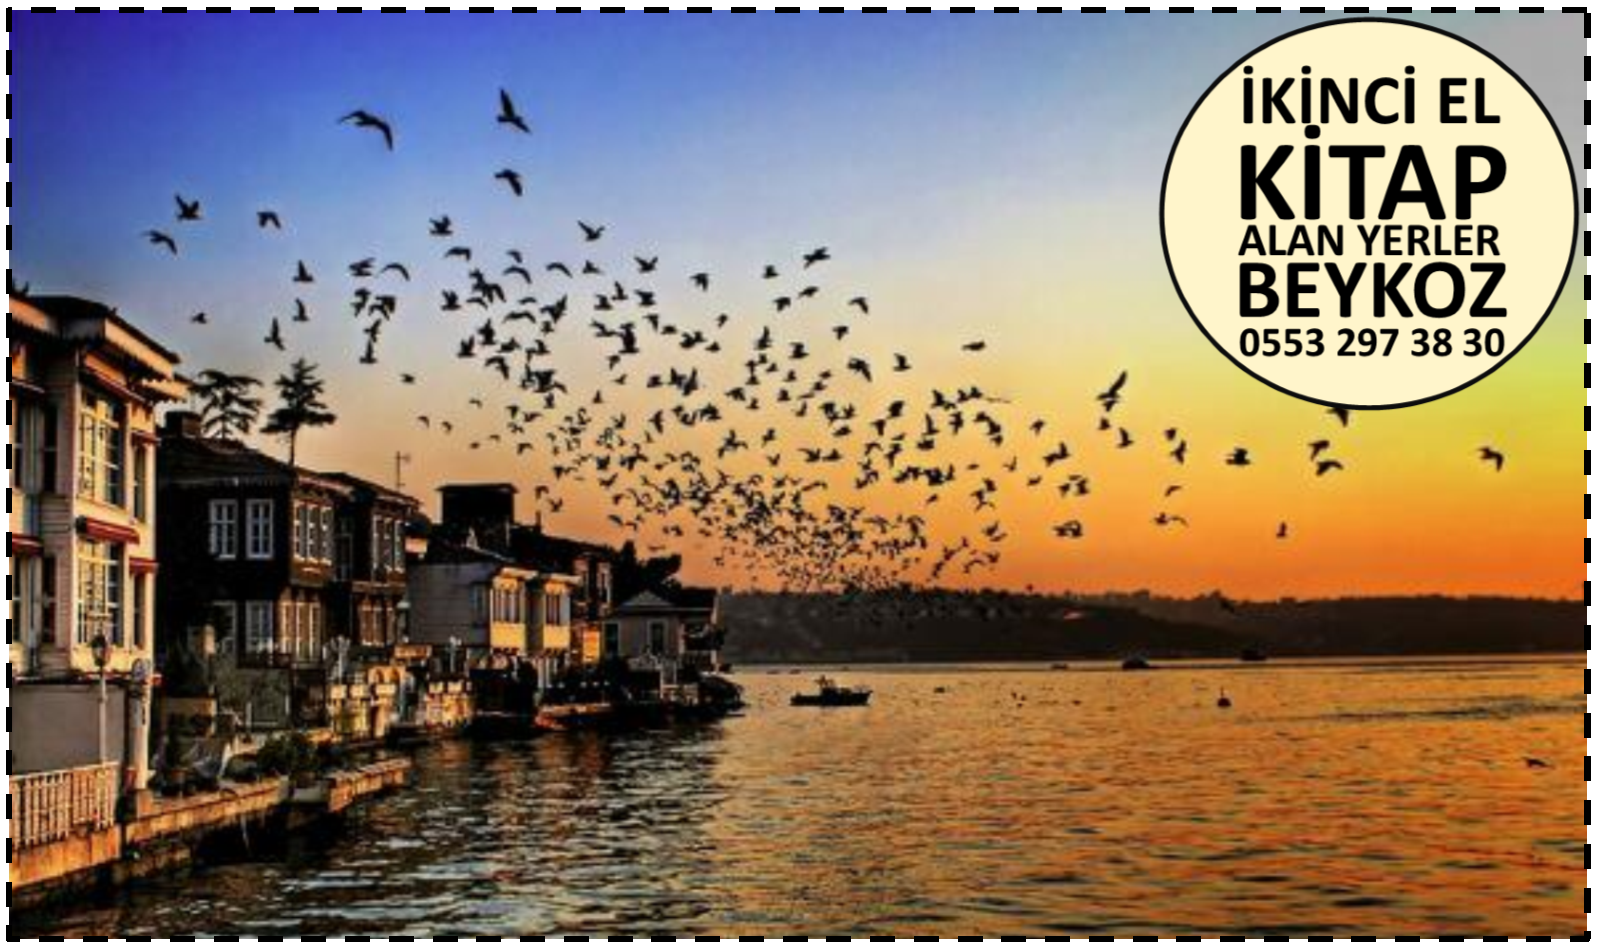 İkinci El Kitap Alan Yerler Beykoz / İstanbul - 0553 297 38 30